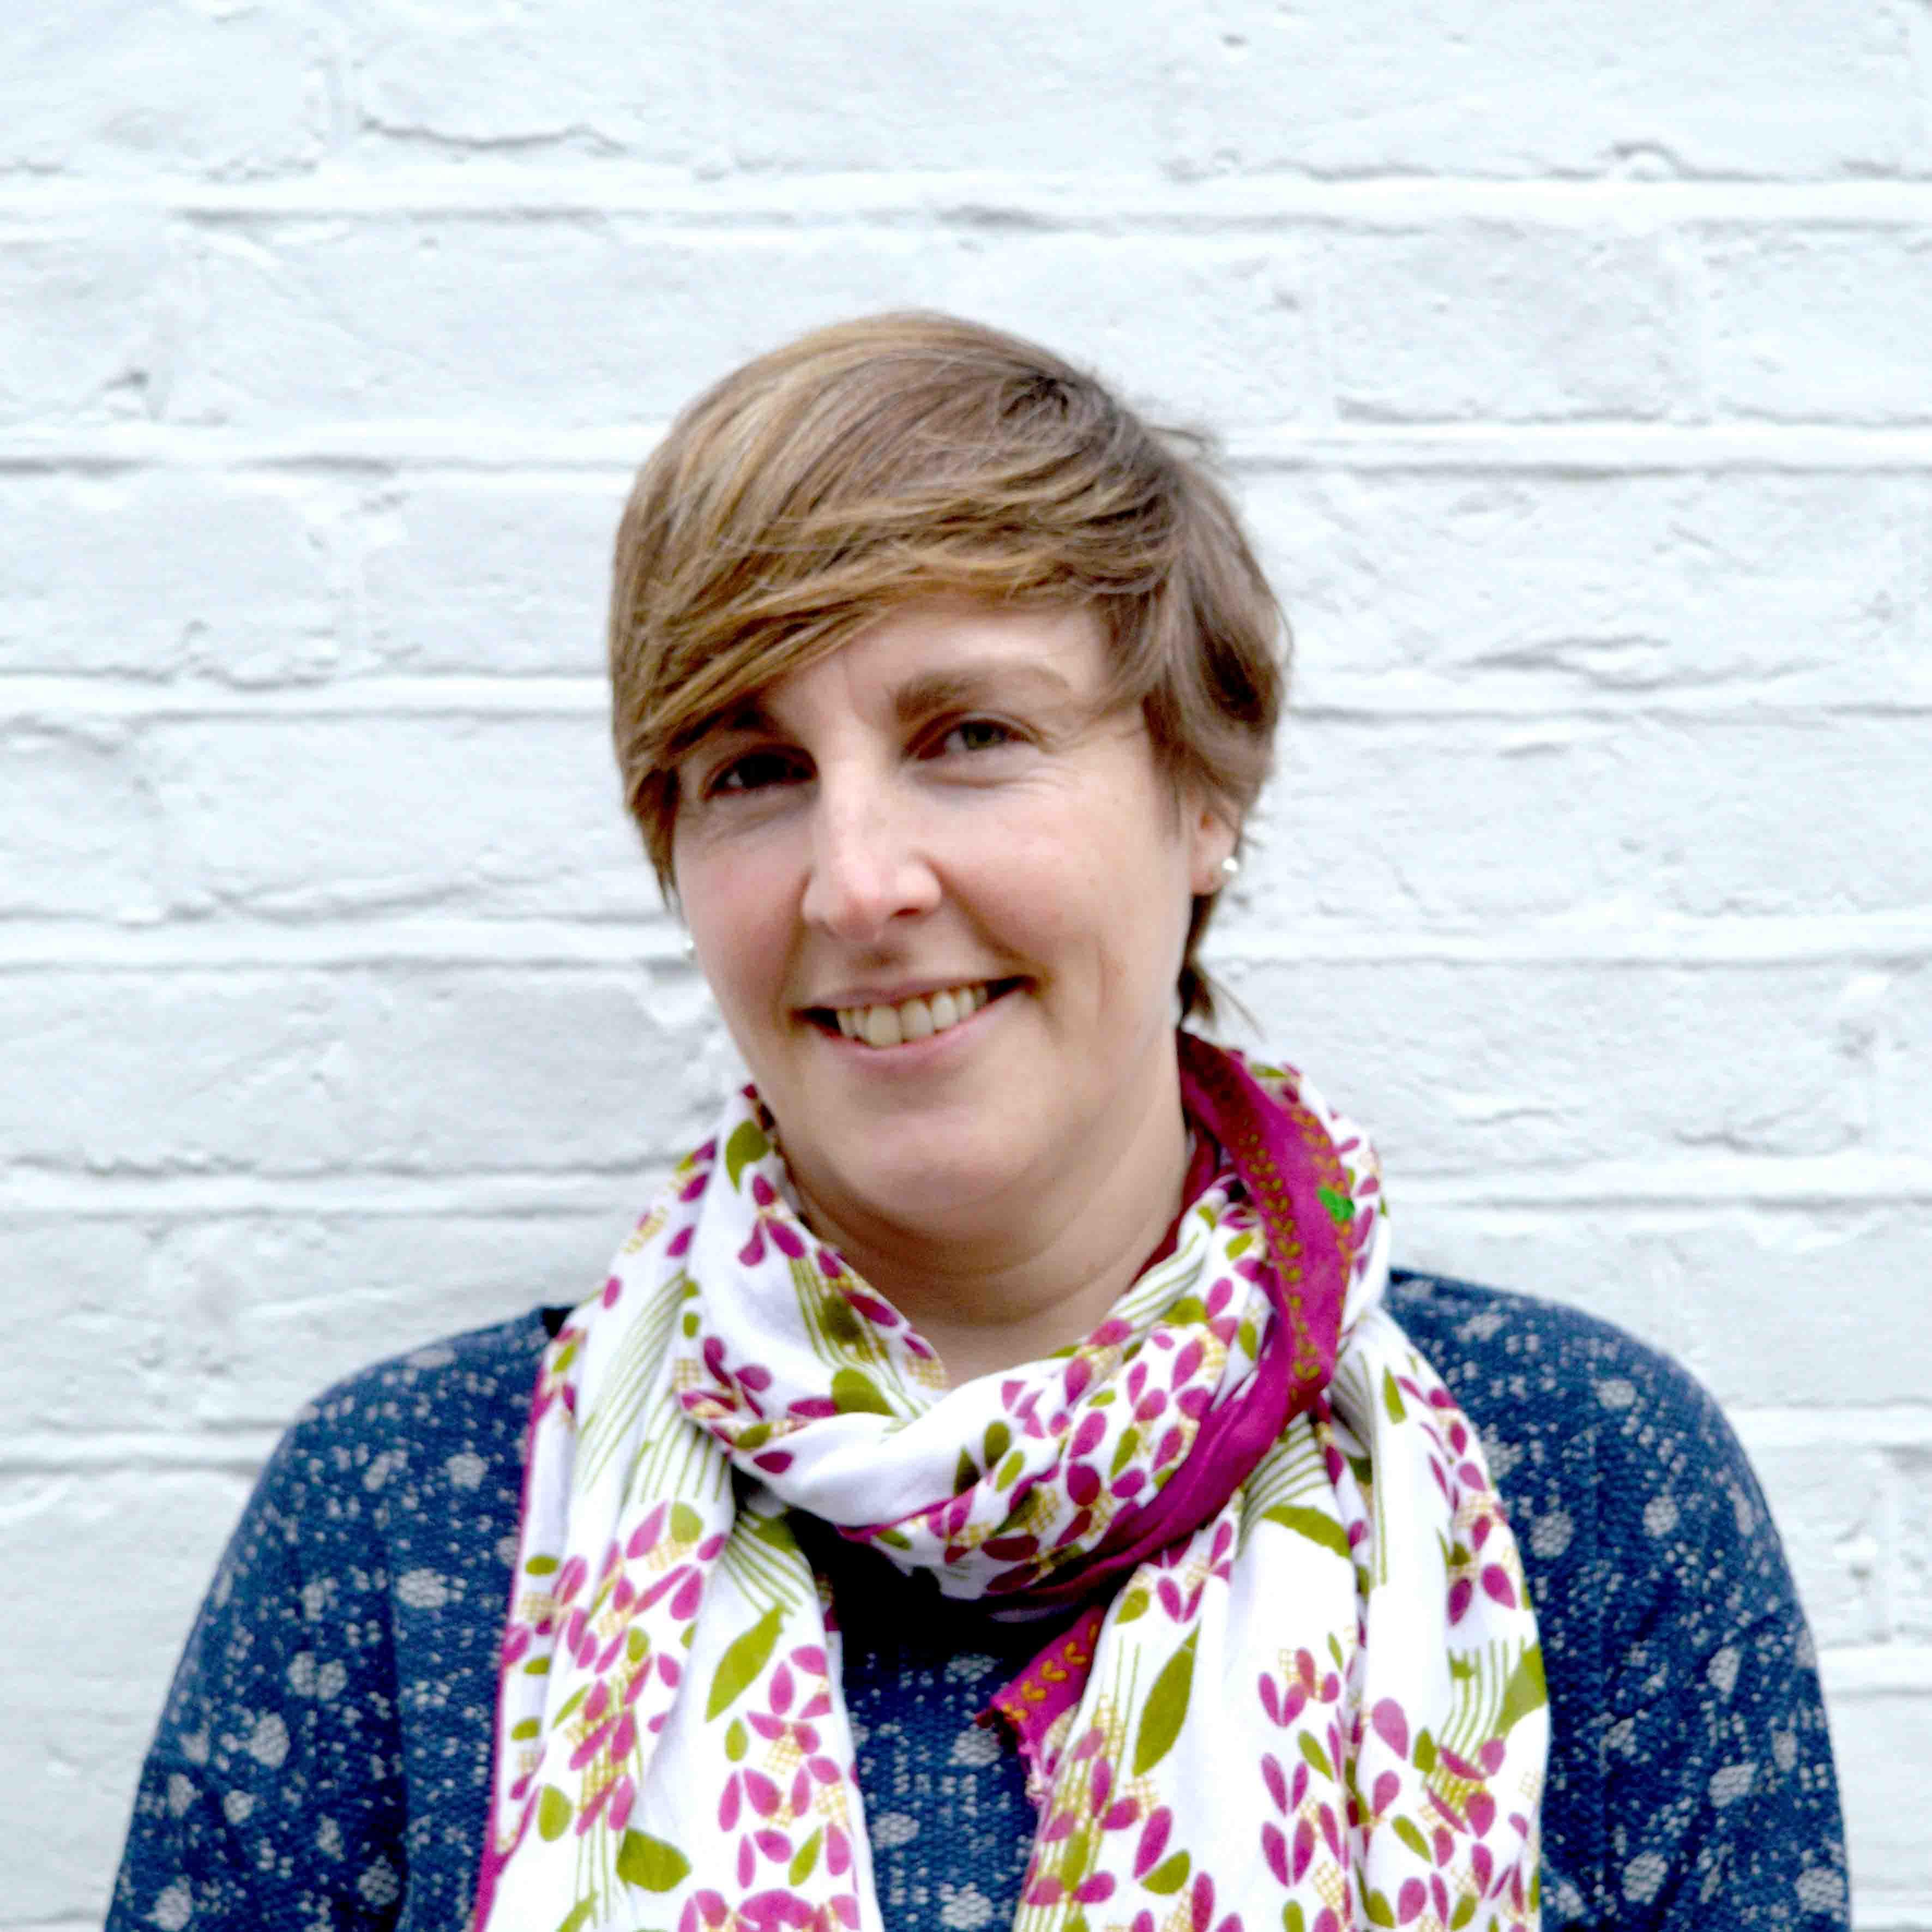 Victoria Shipton